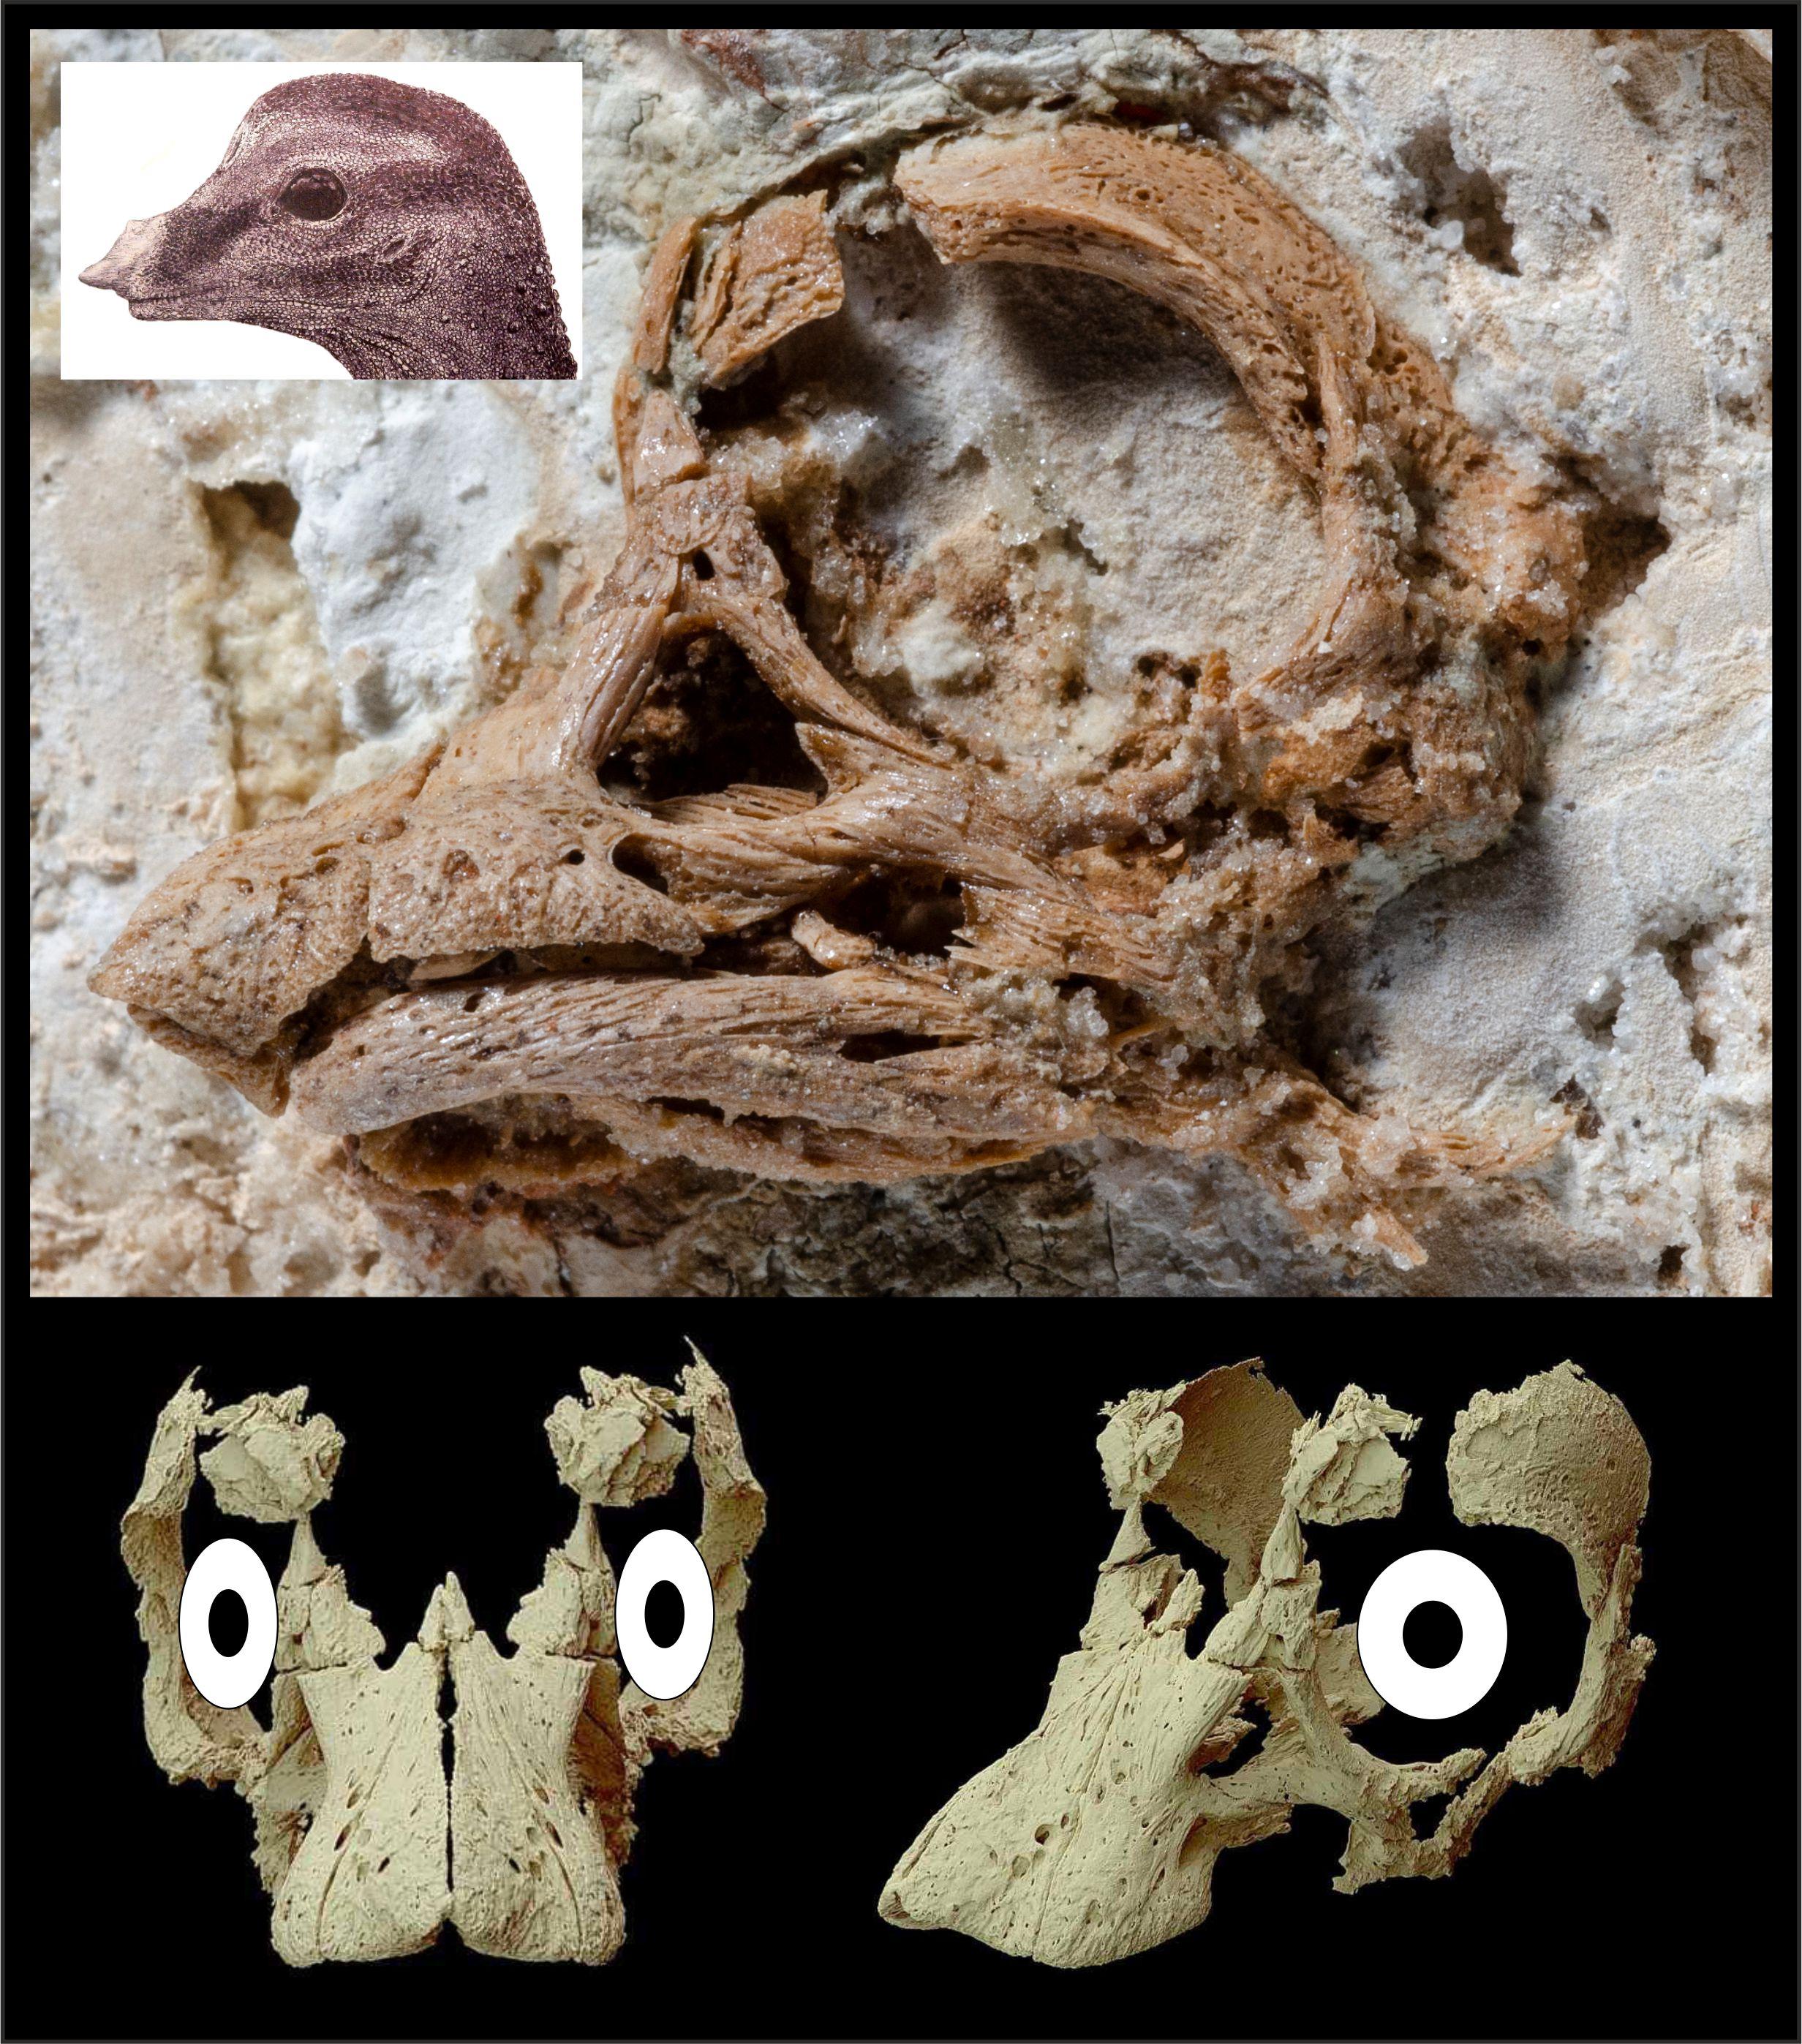 Titanosaurian embryo skull with reconstructions